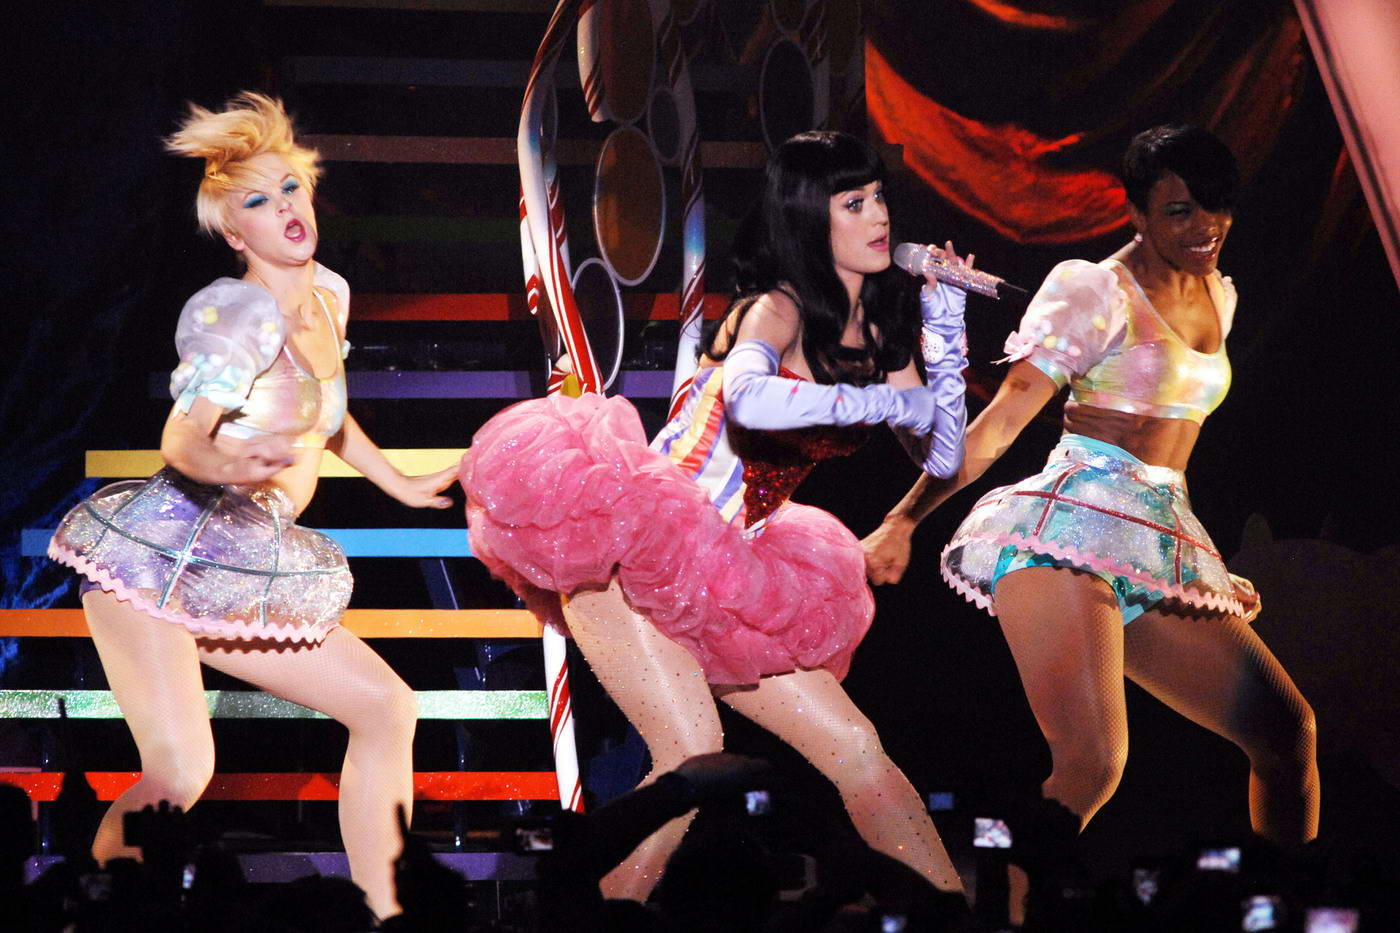 http://4.bp.blogspot.com/-nB83f2FYRoI/TWabNT3p8WI/AAAAAAAAA-A/5cpGkgZ8aKc/s1600/katy_perry_show_live_7.jpg